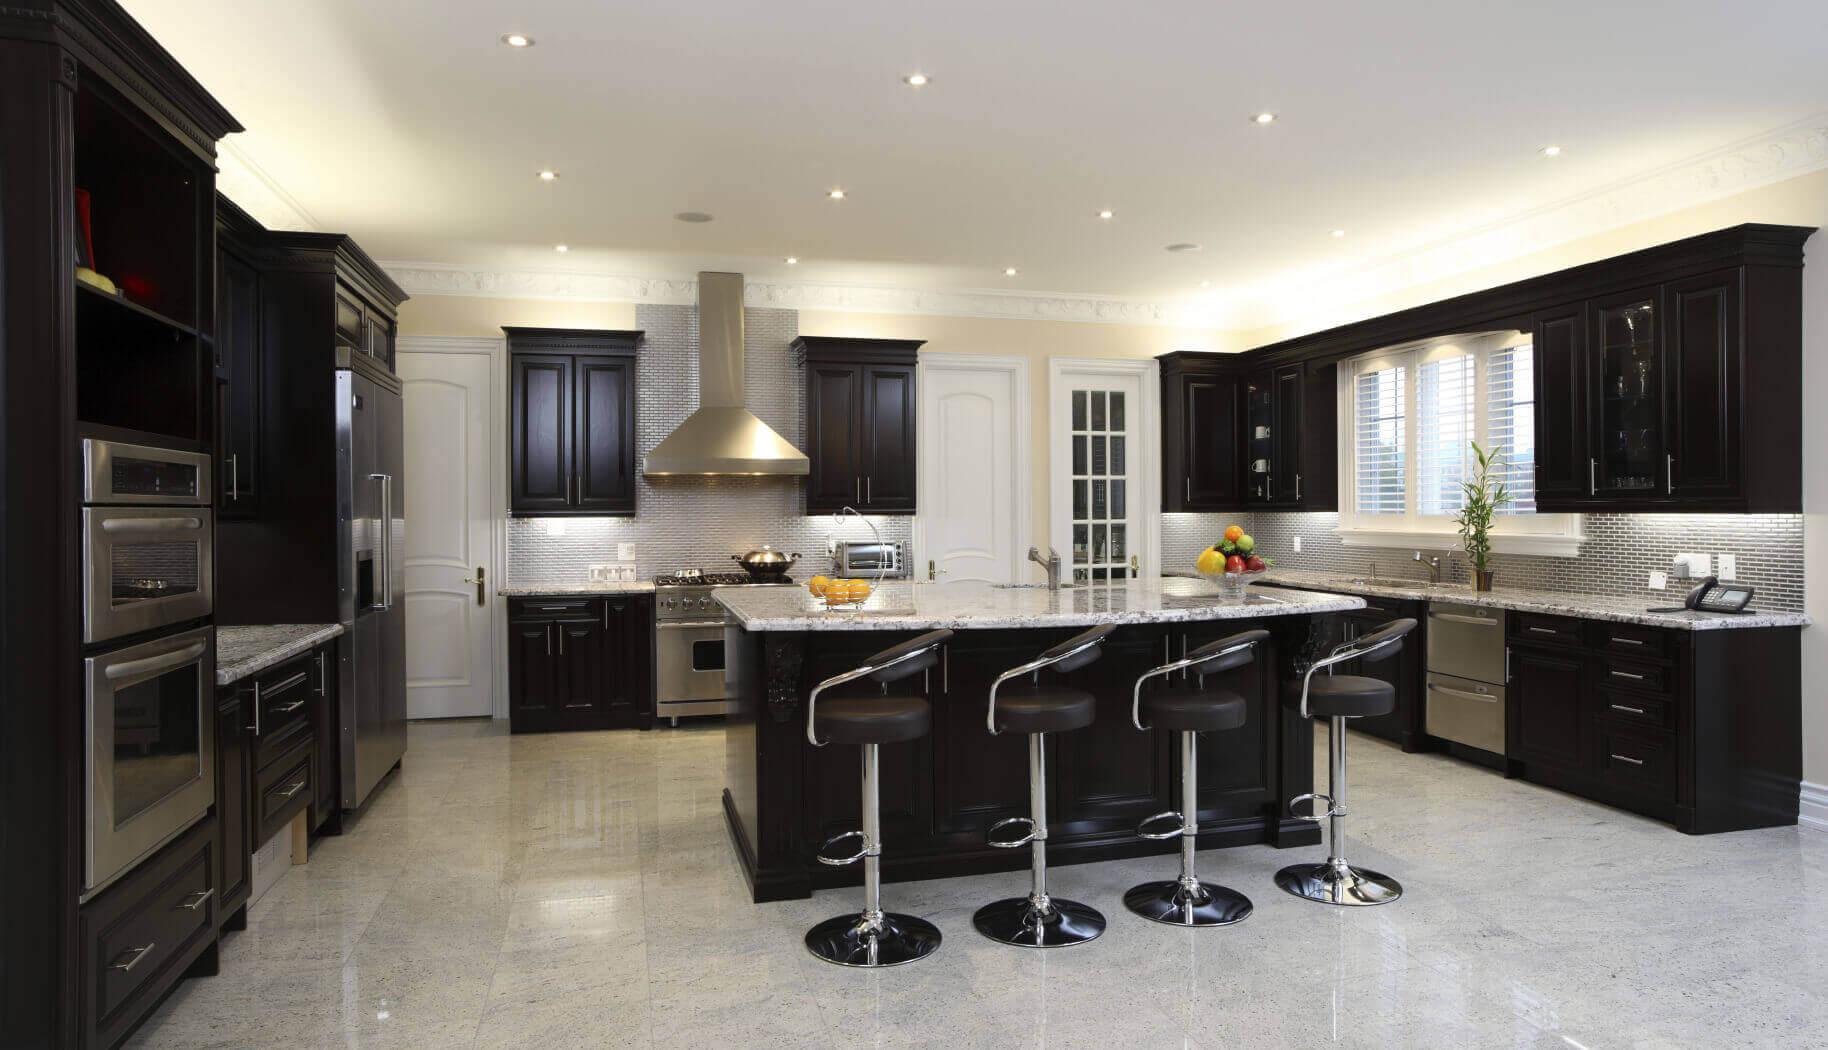 89+ Contemporary Kitchen Design Ideas Gallery